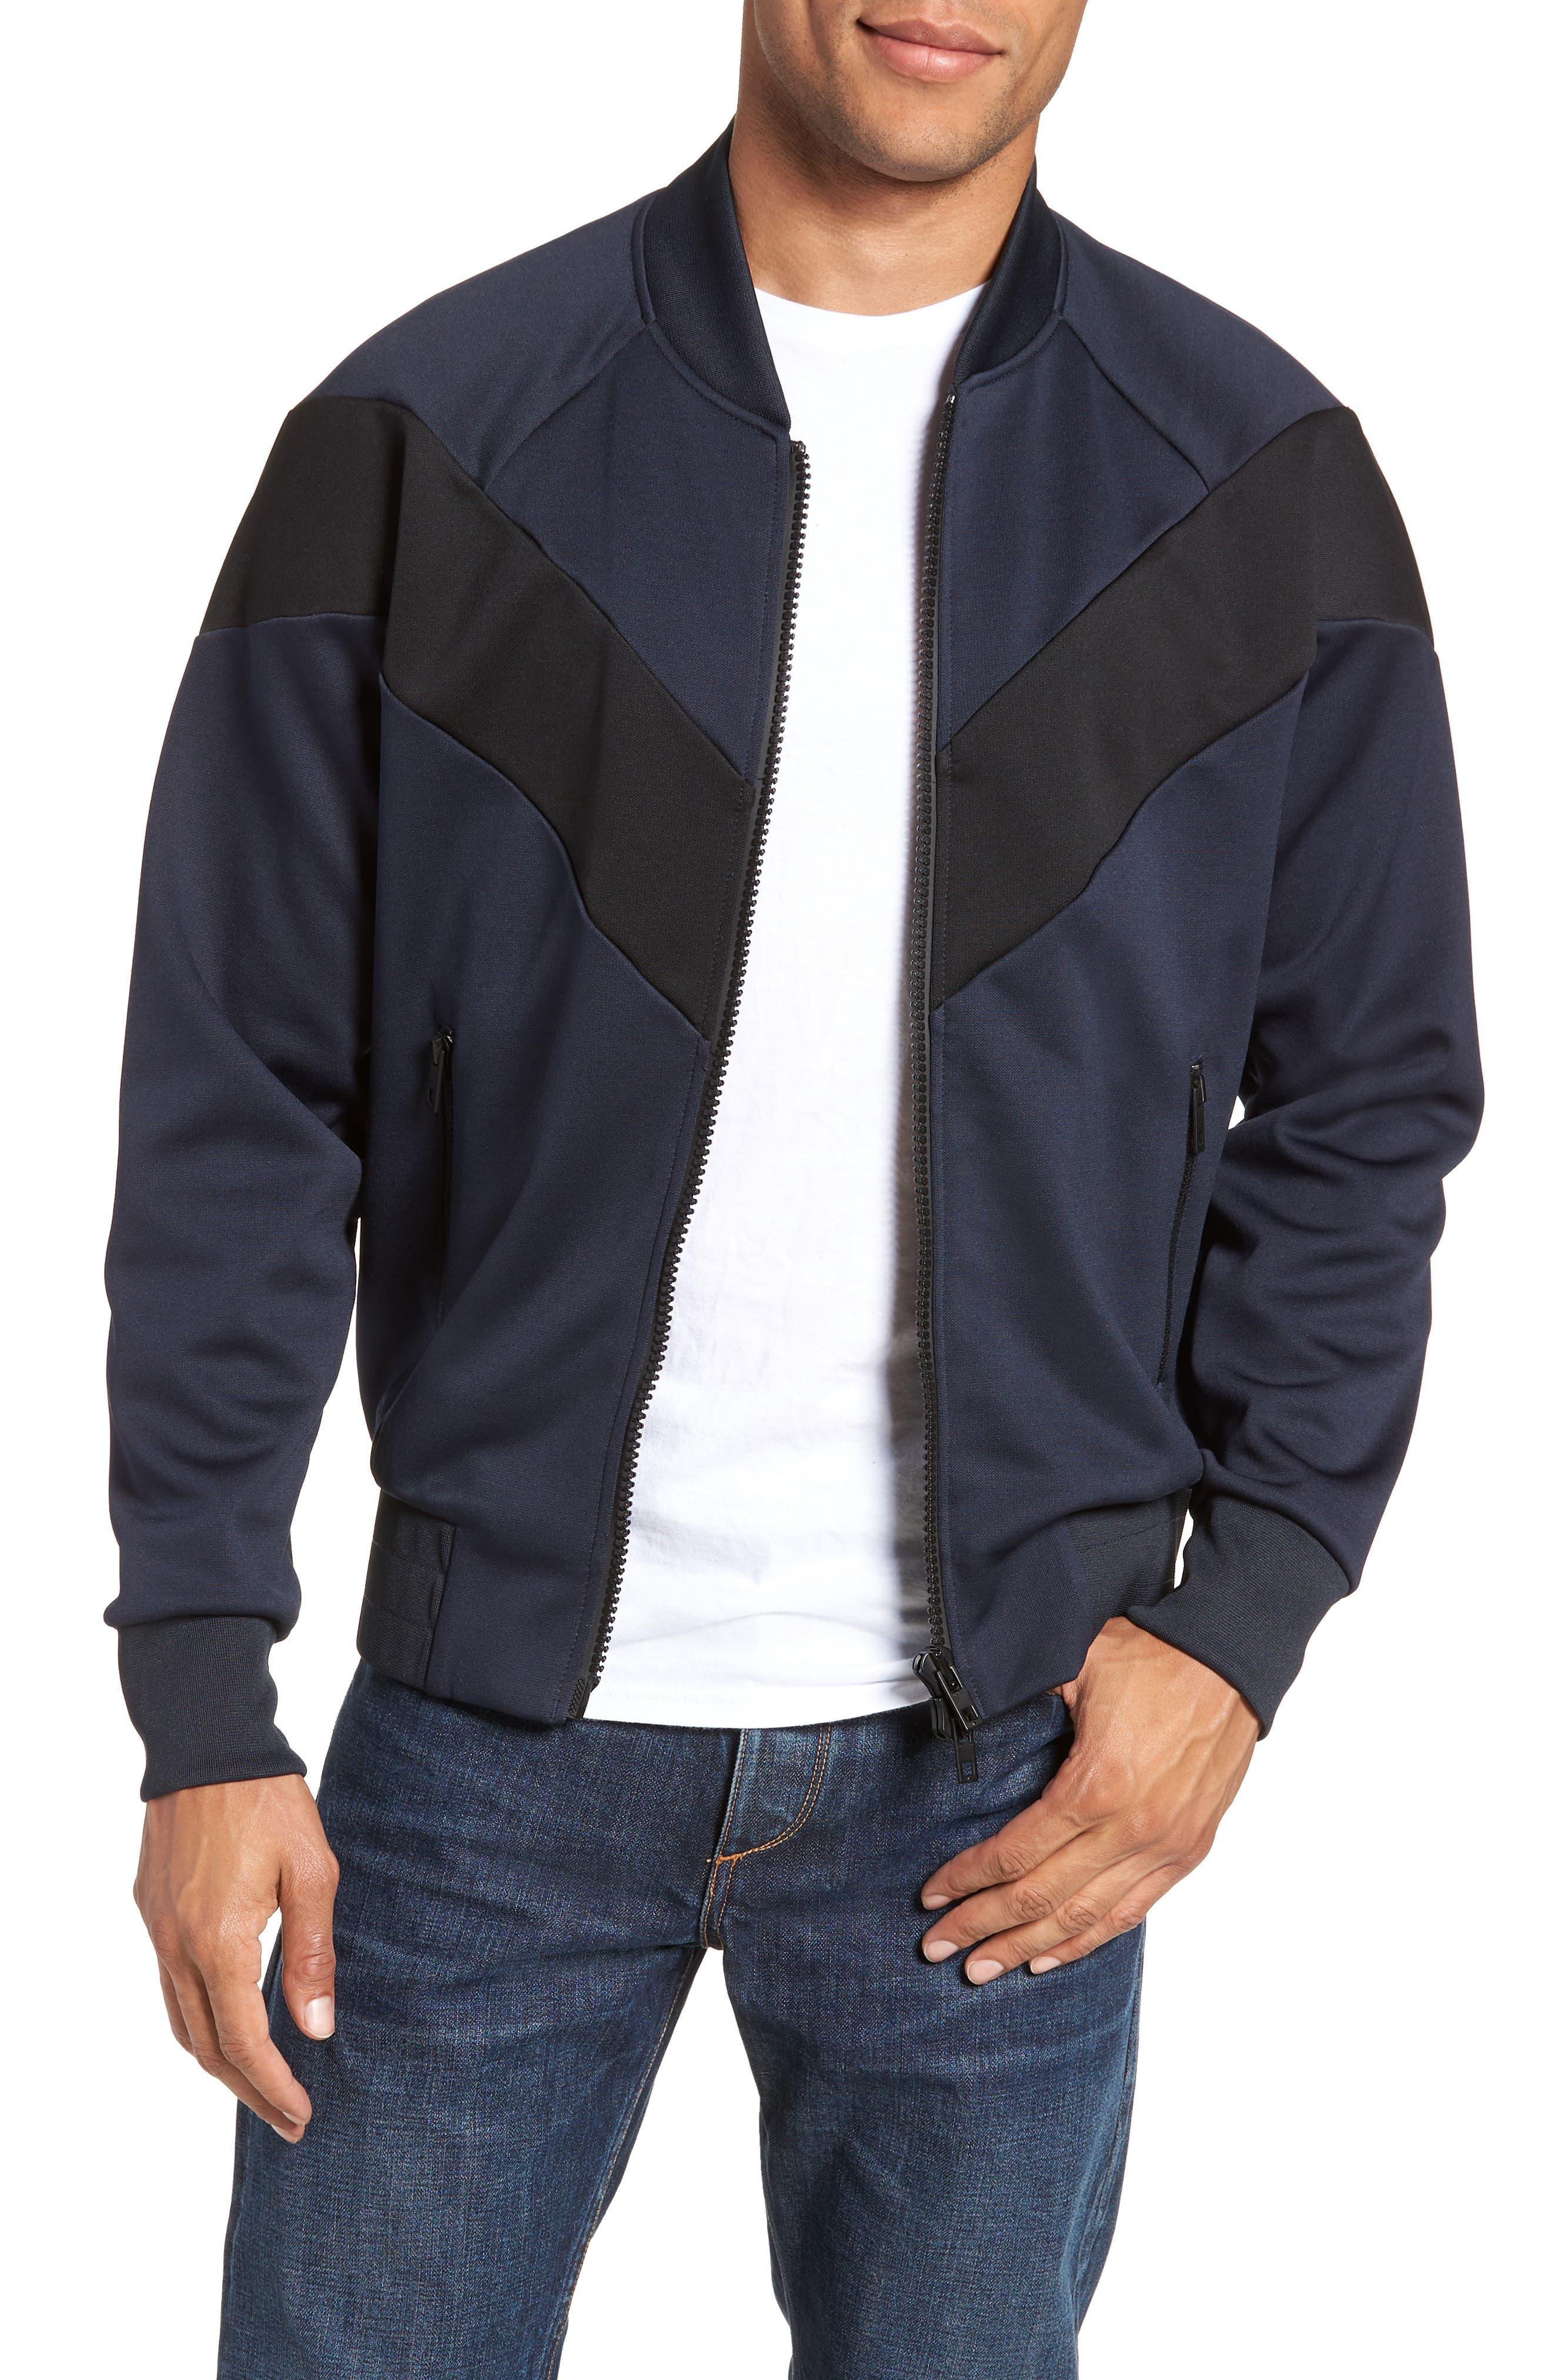 Colorblock Slim Fit Bomber Jacket,                             Main thumbnail 1, color,                             NAVY/ BLACK